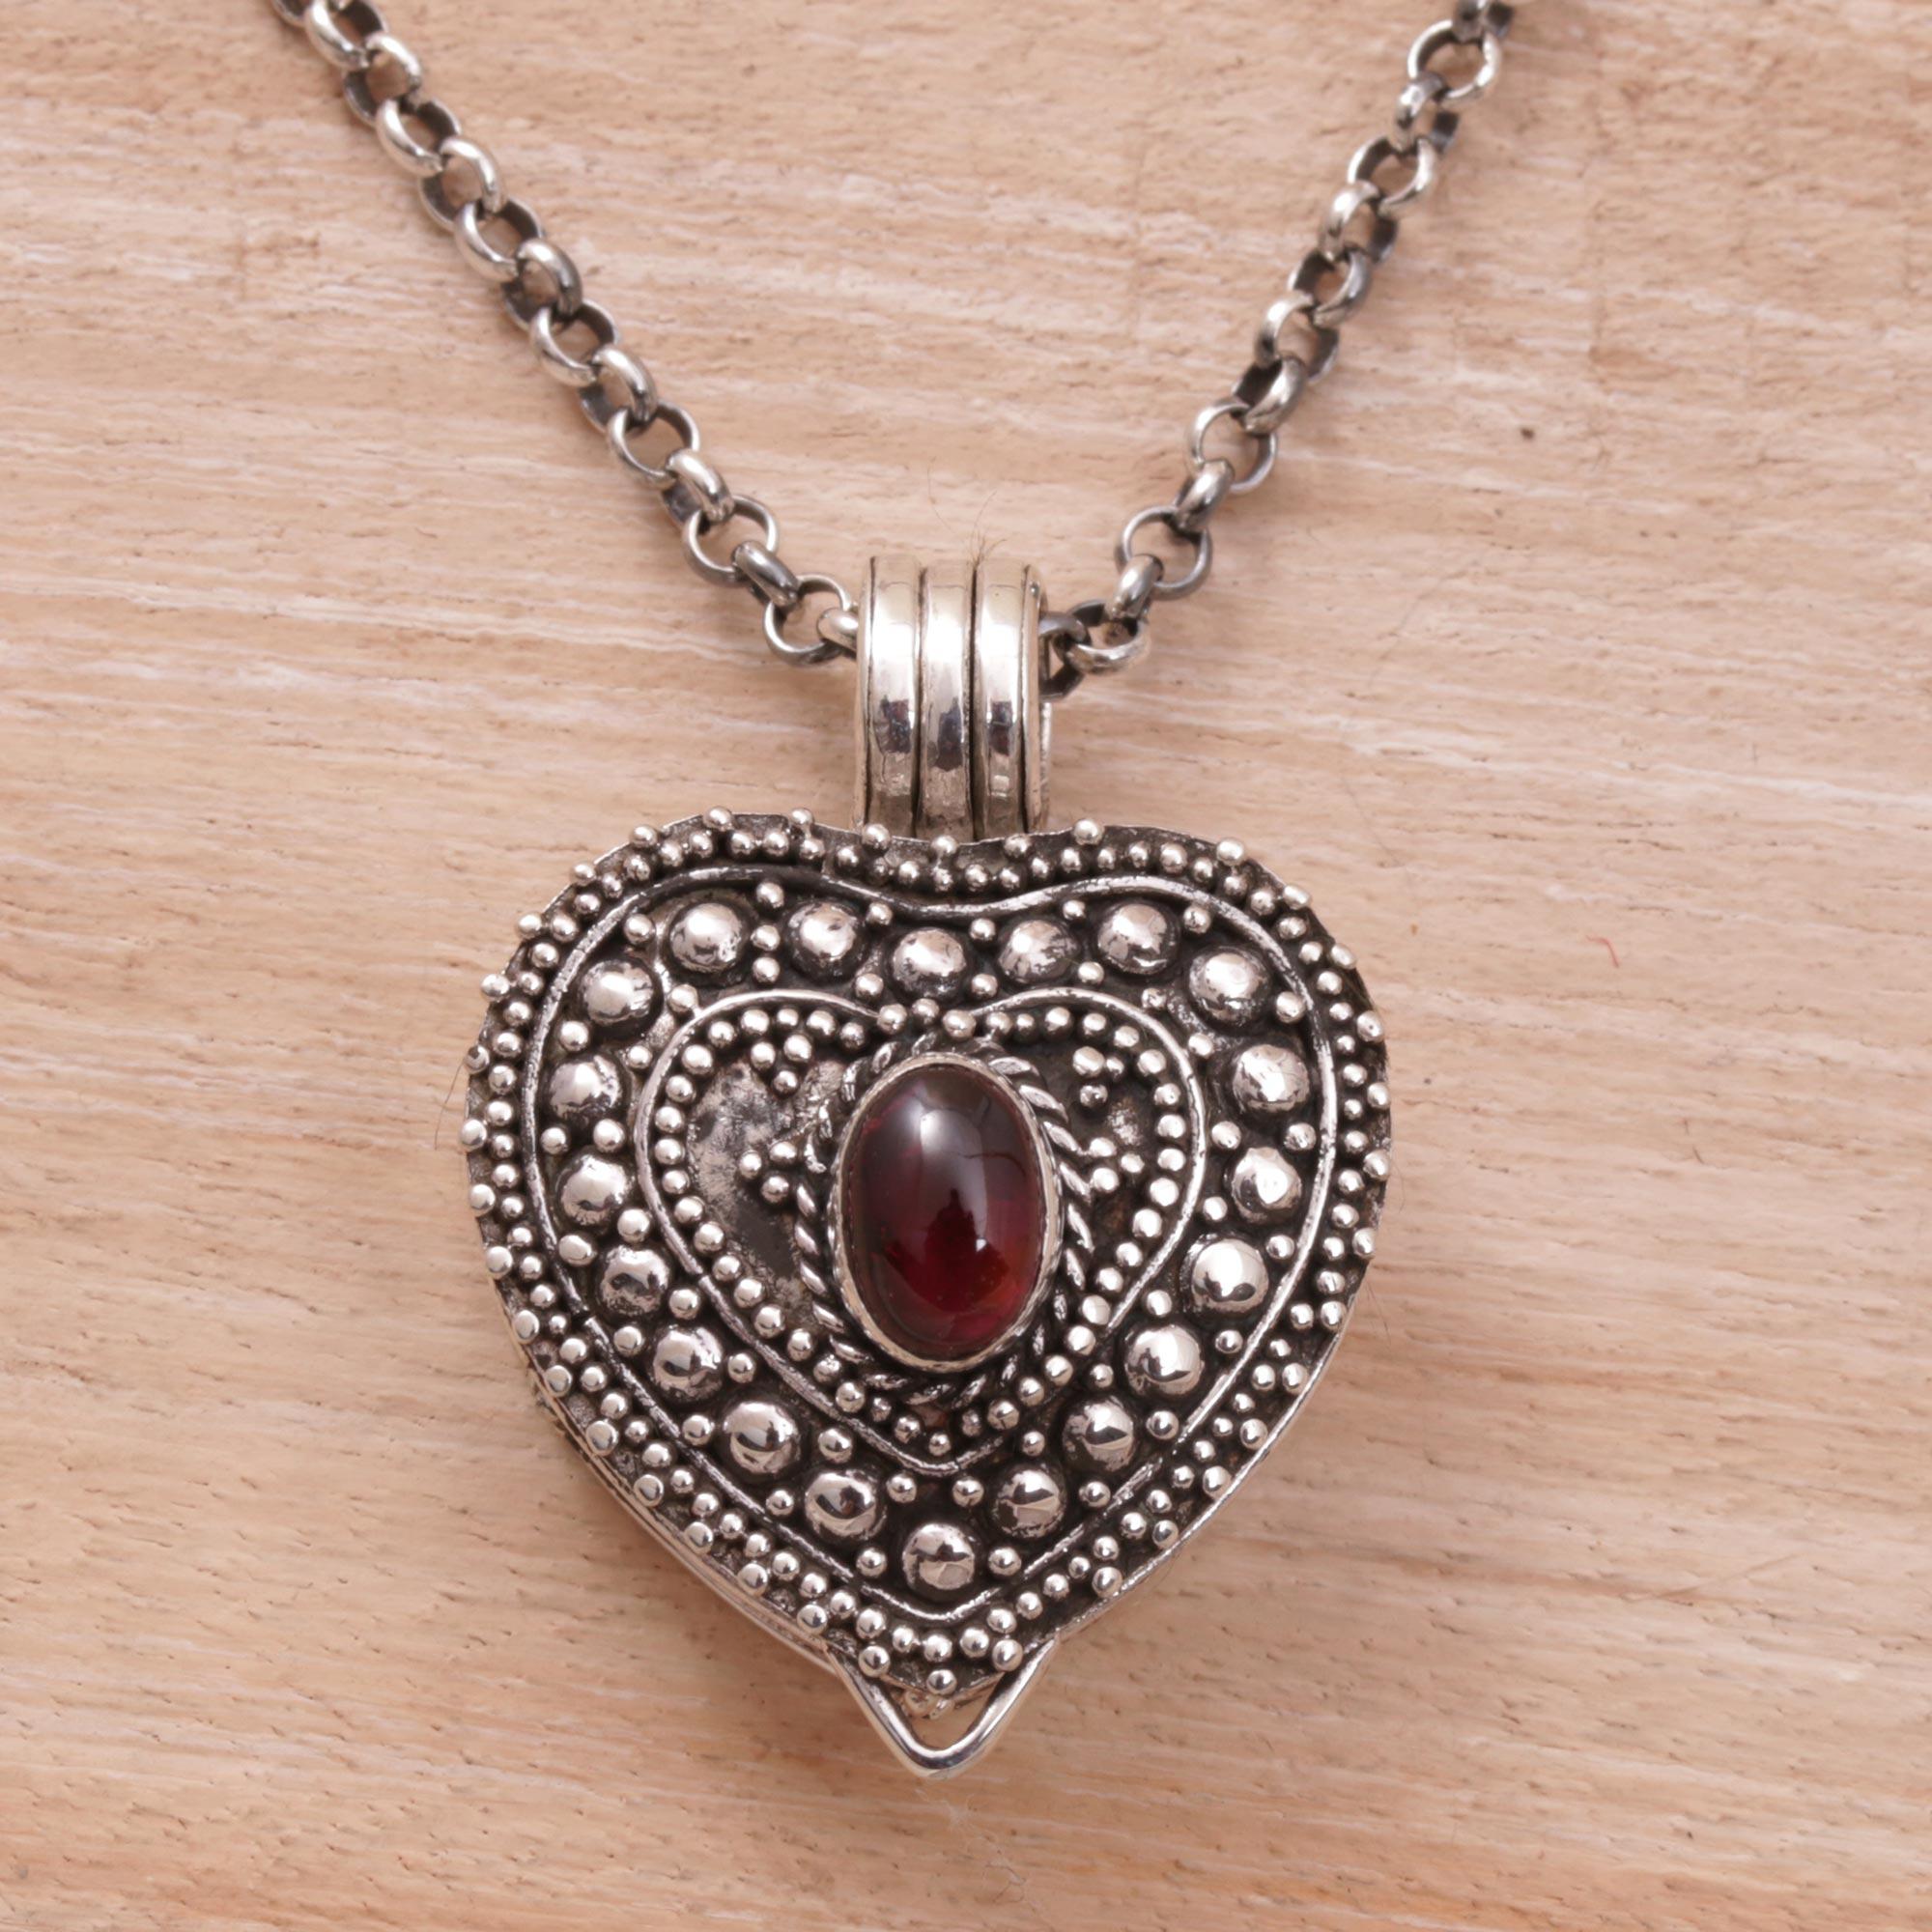 497e2529e4369 Garnet and Sterling Silver Heart Locket Necklace, 'Garnet Love'